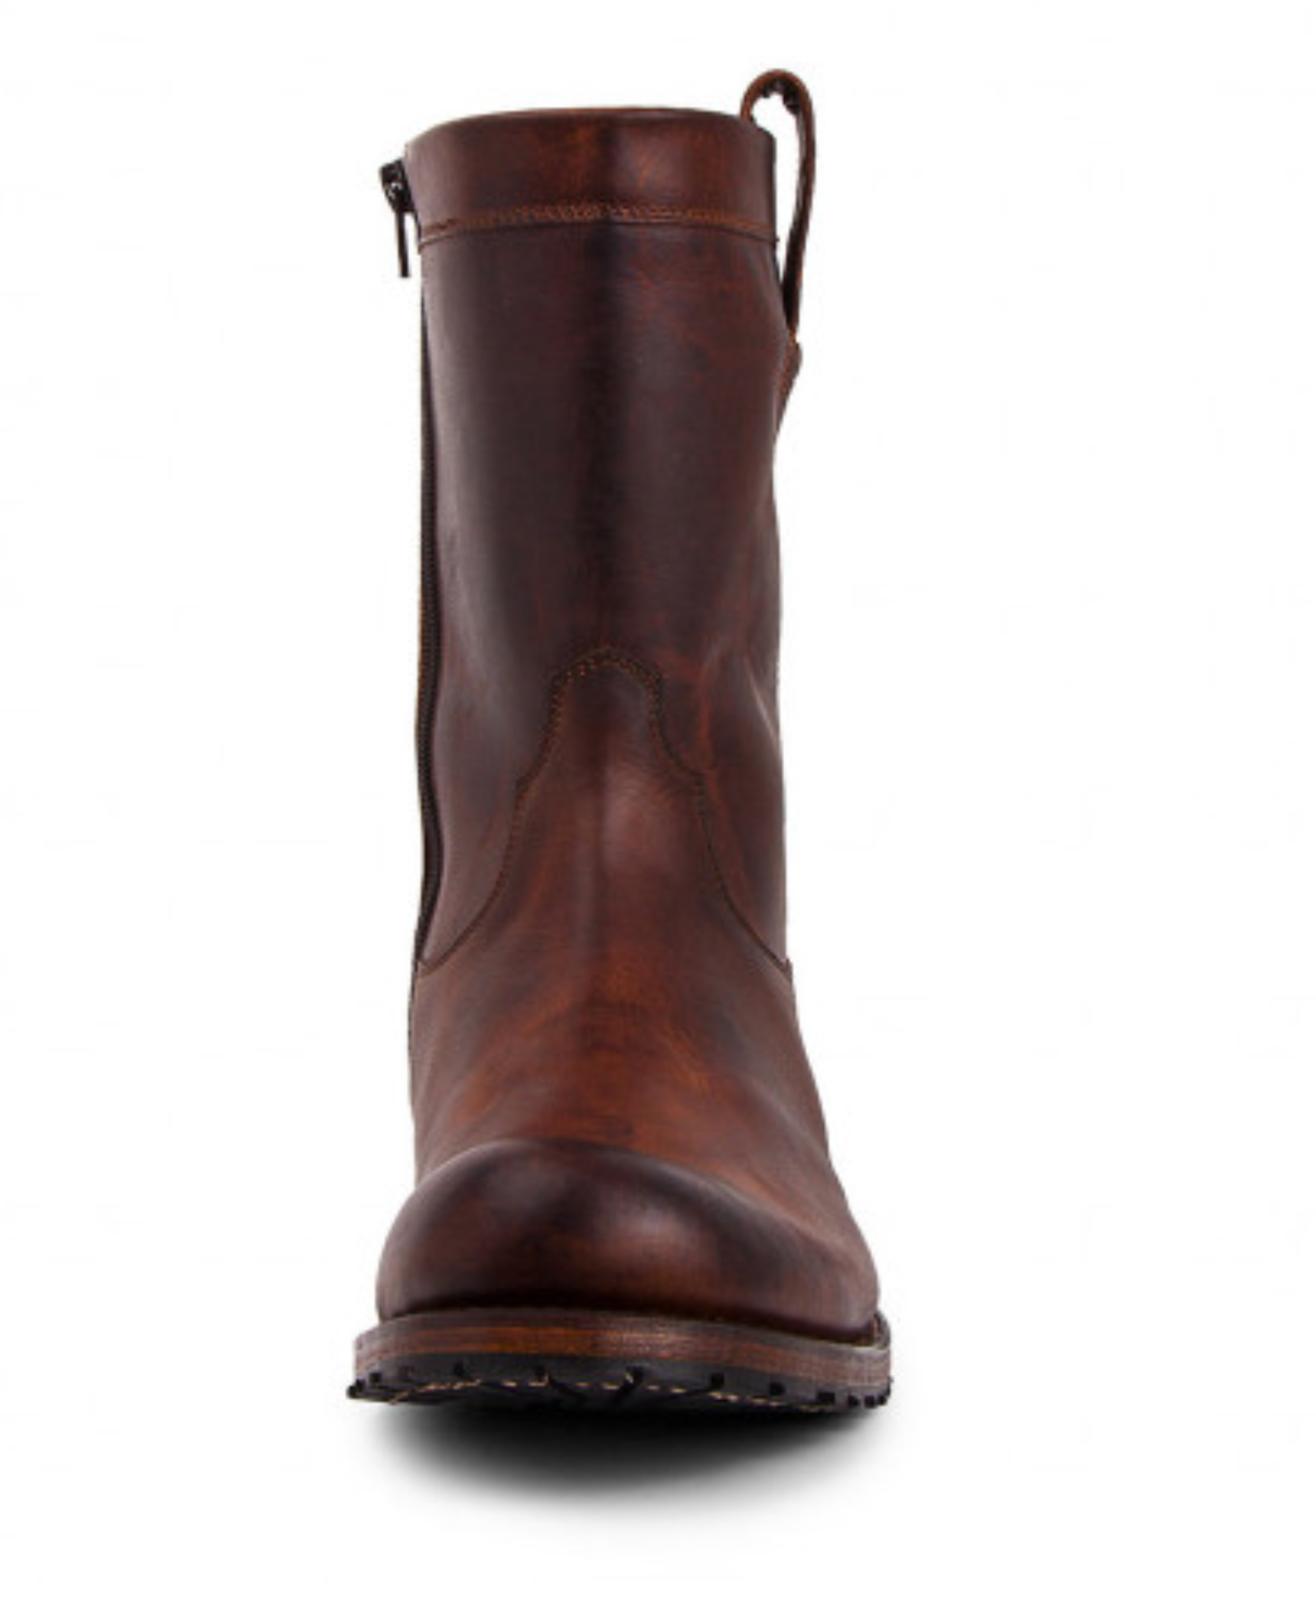 7133 Sendra boots boots Sendra western marron ******Superbe promo**** 8b6d56